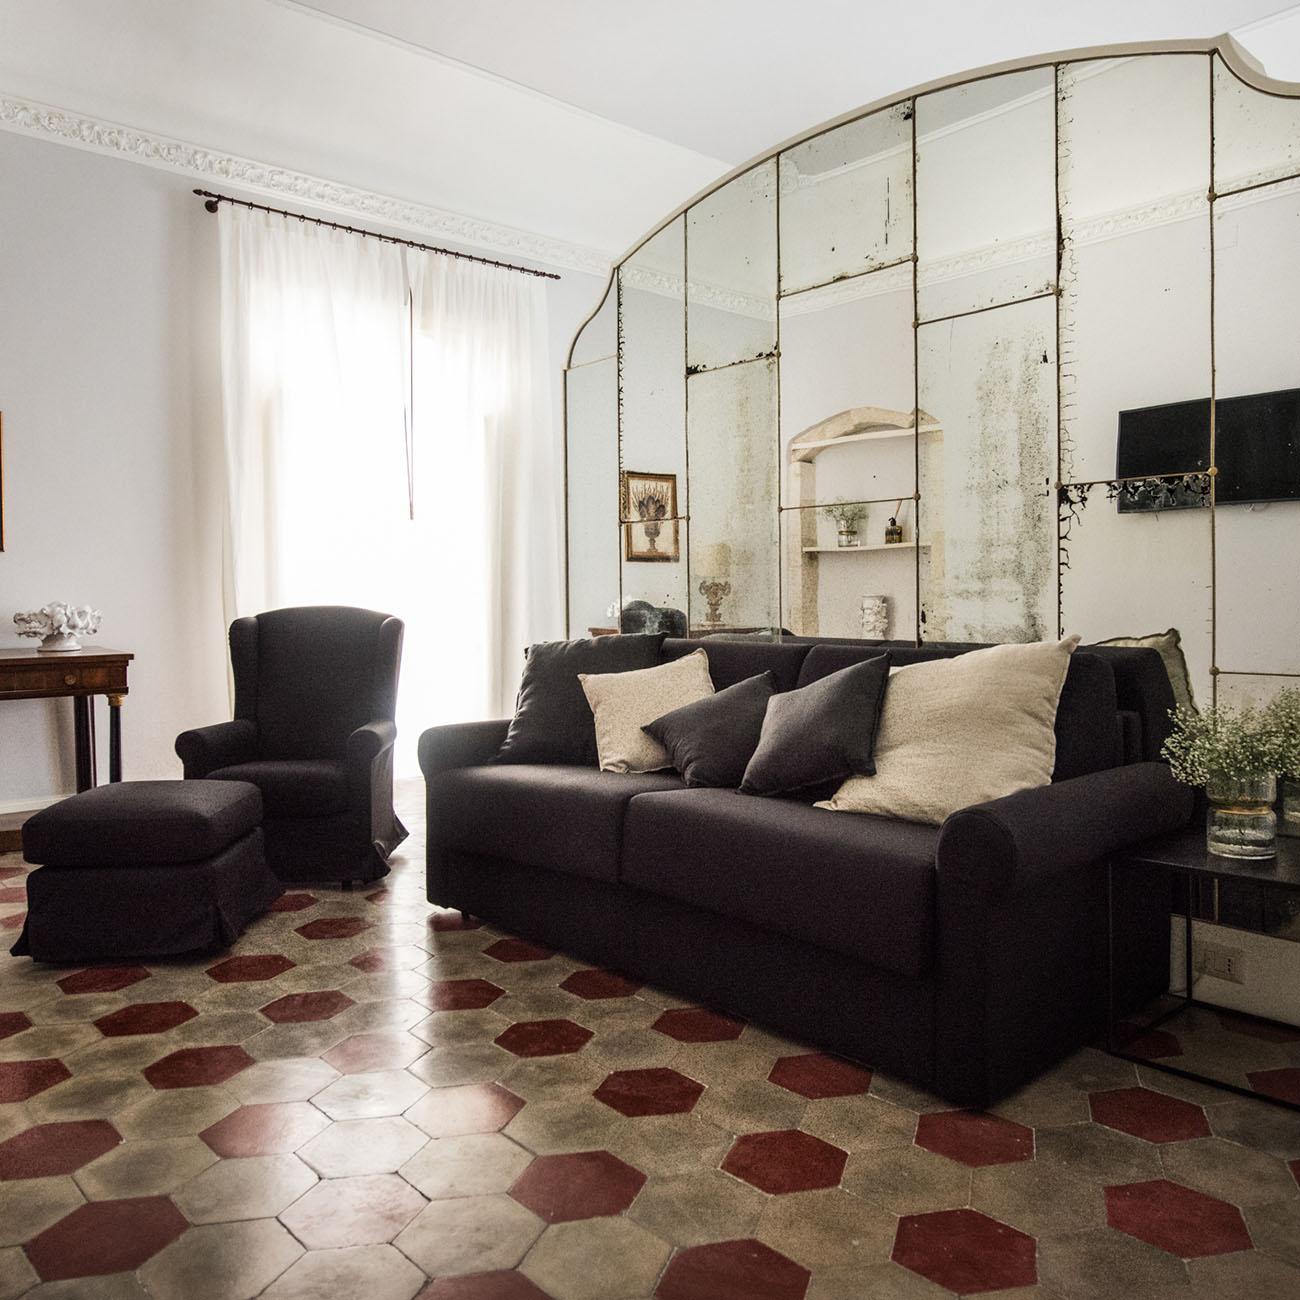 san carlo suite - Suite San Carlo